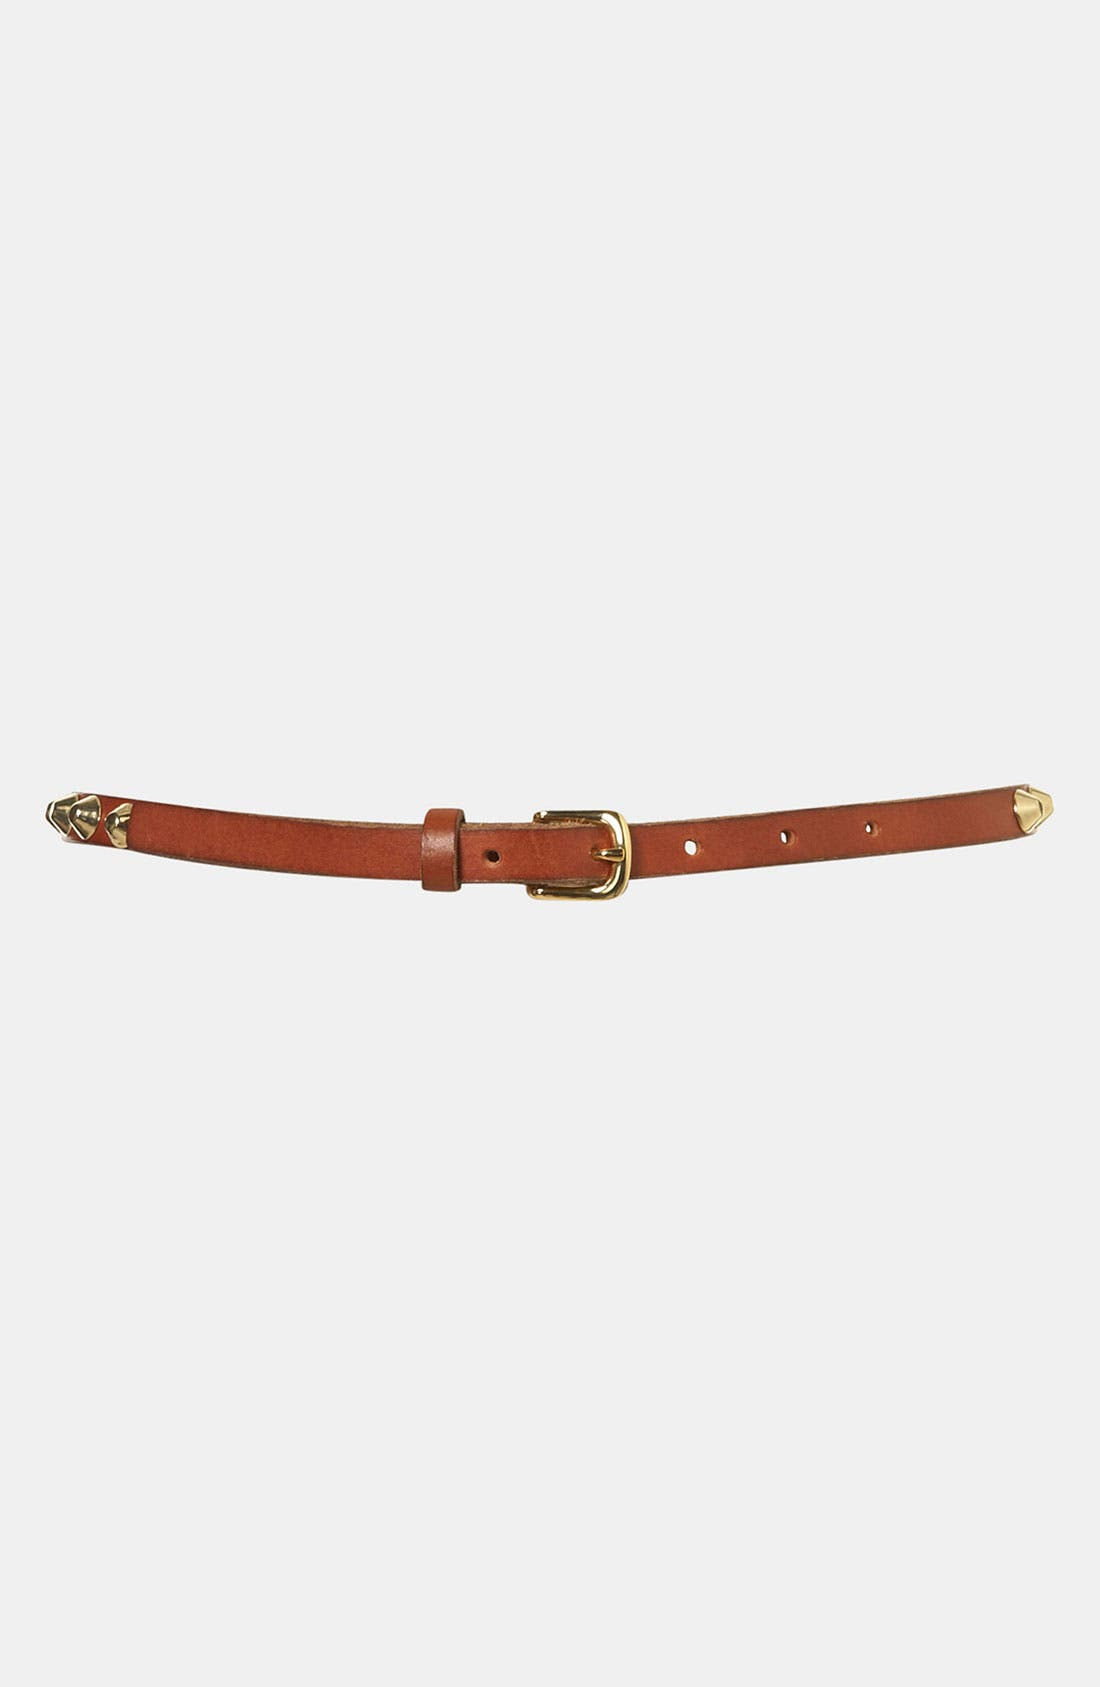 Main Image - Topshop 'Grunge' Studded Leather Belt